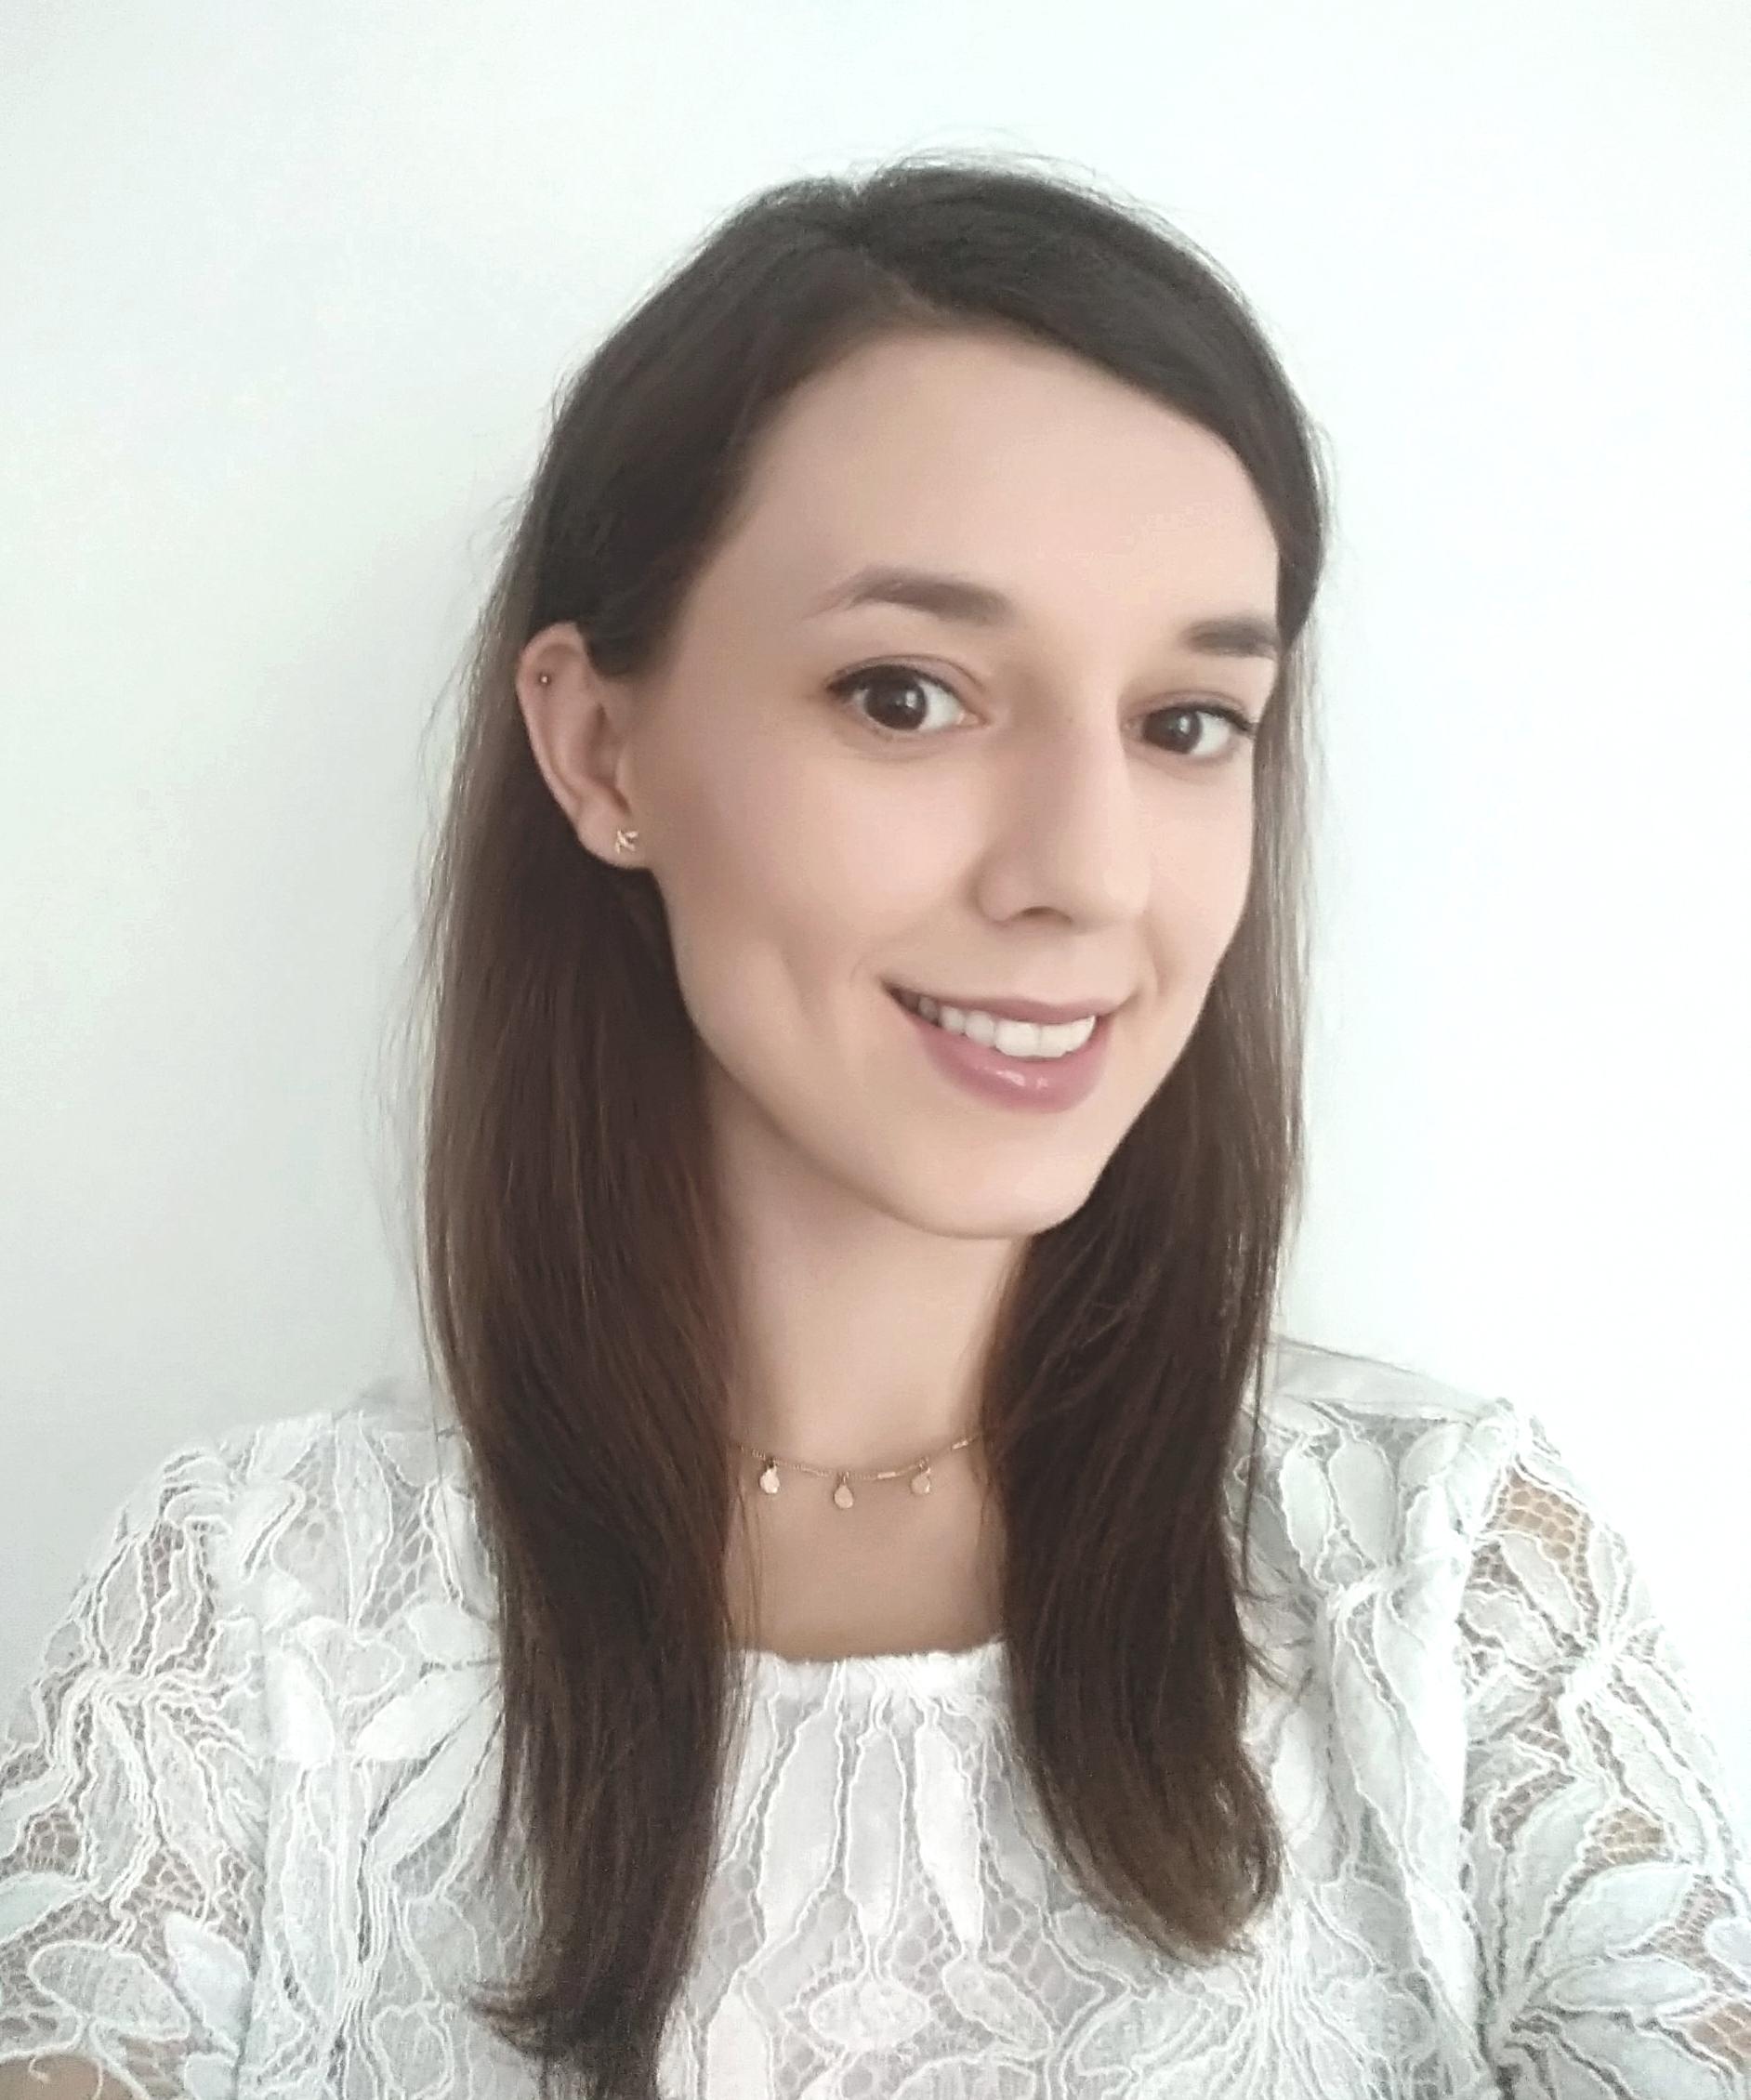 Ewa Korzeniewska